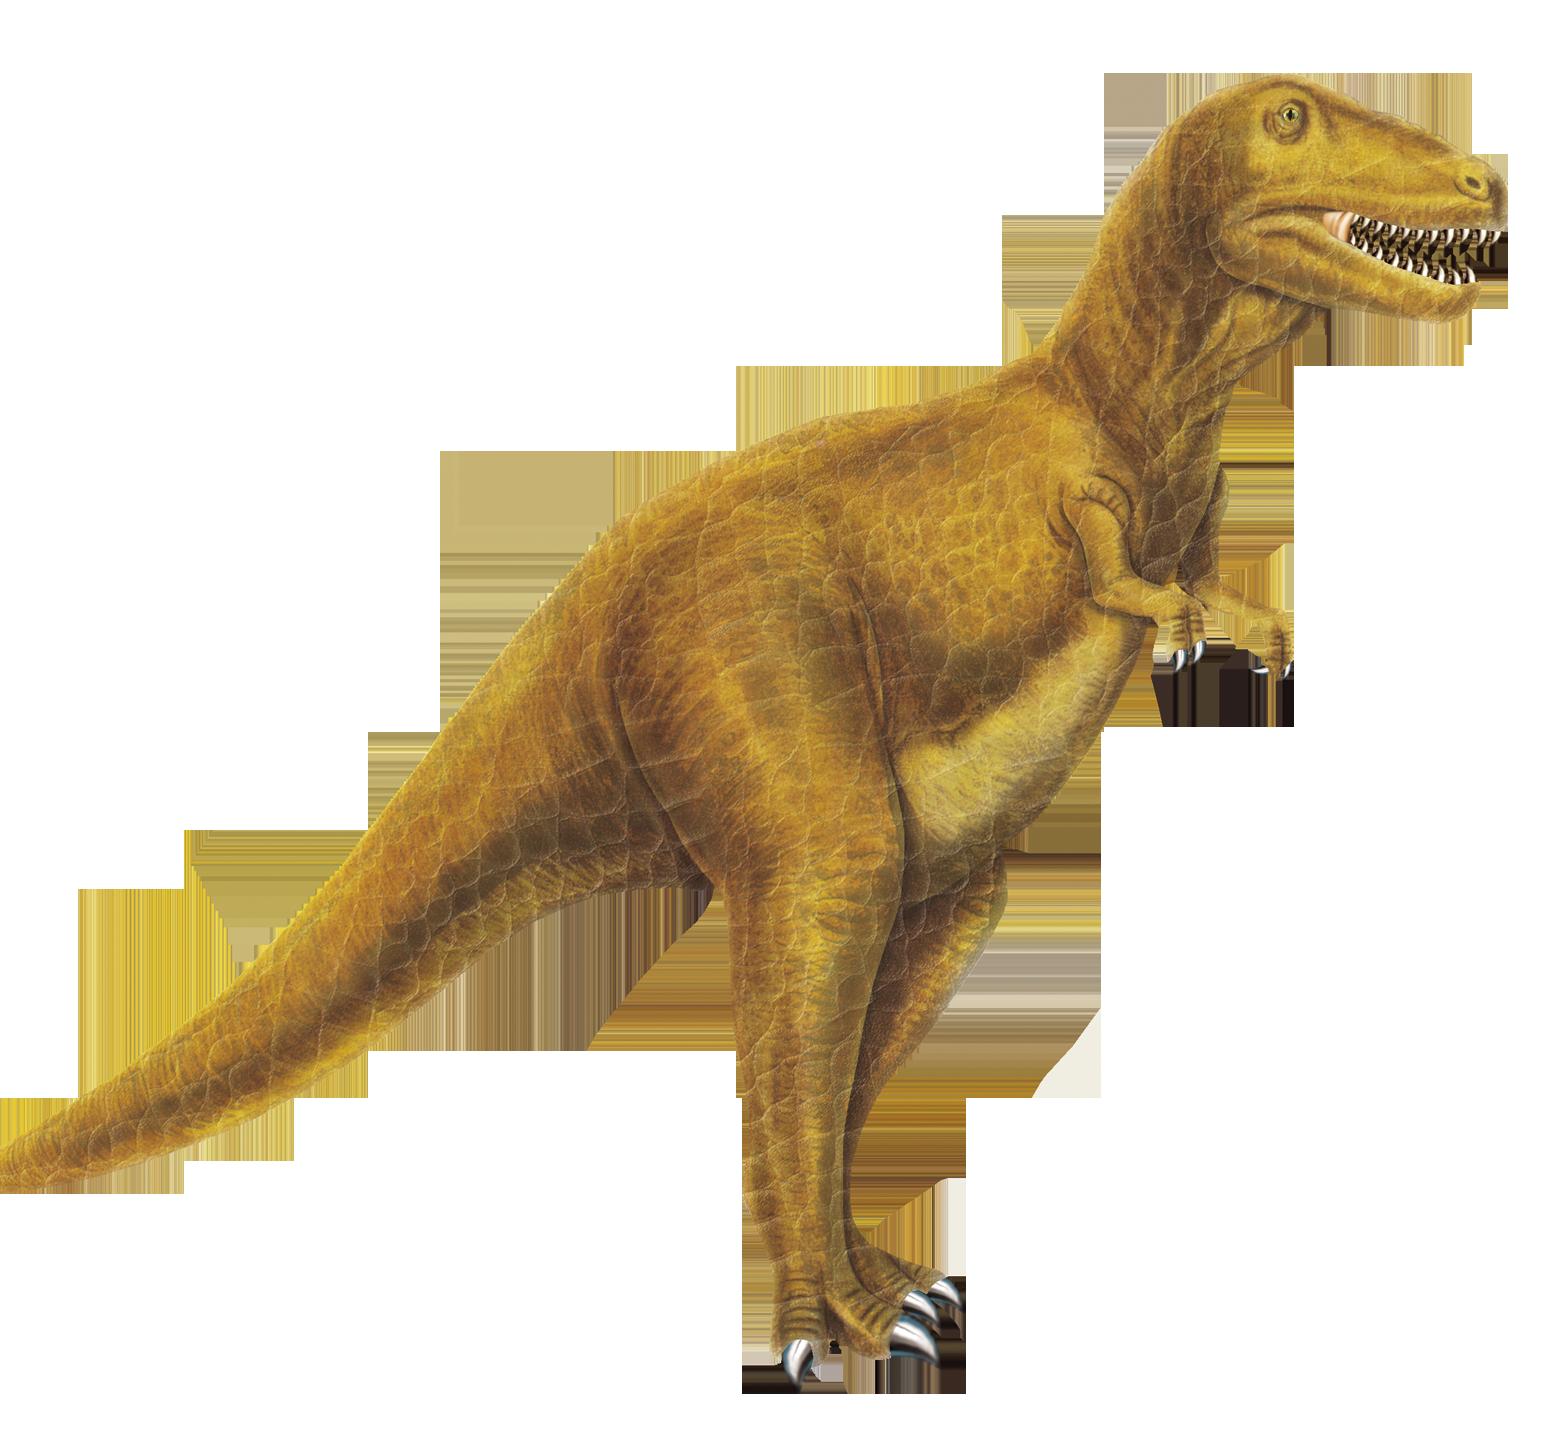 Free Tyrannosaurus Rex Dinosaur Pictures